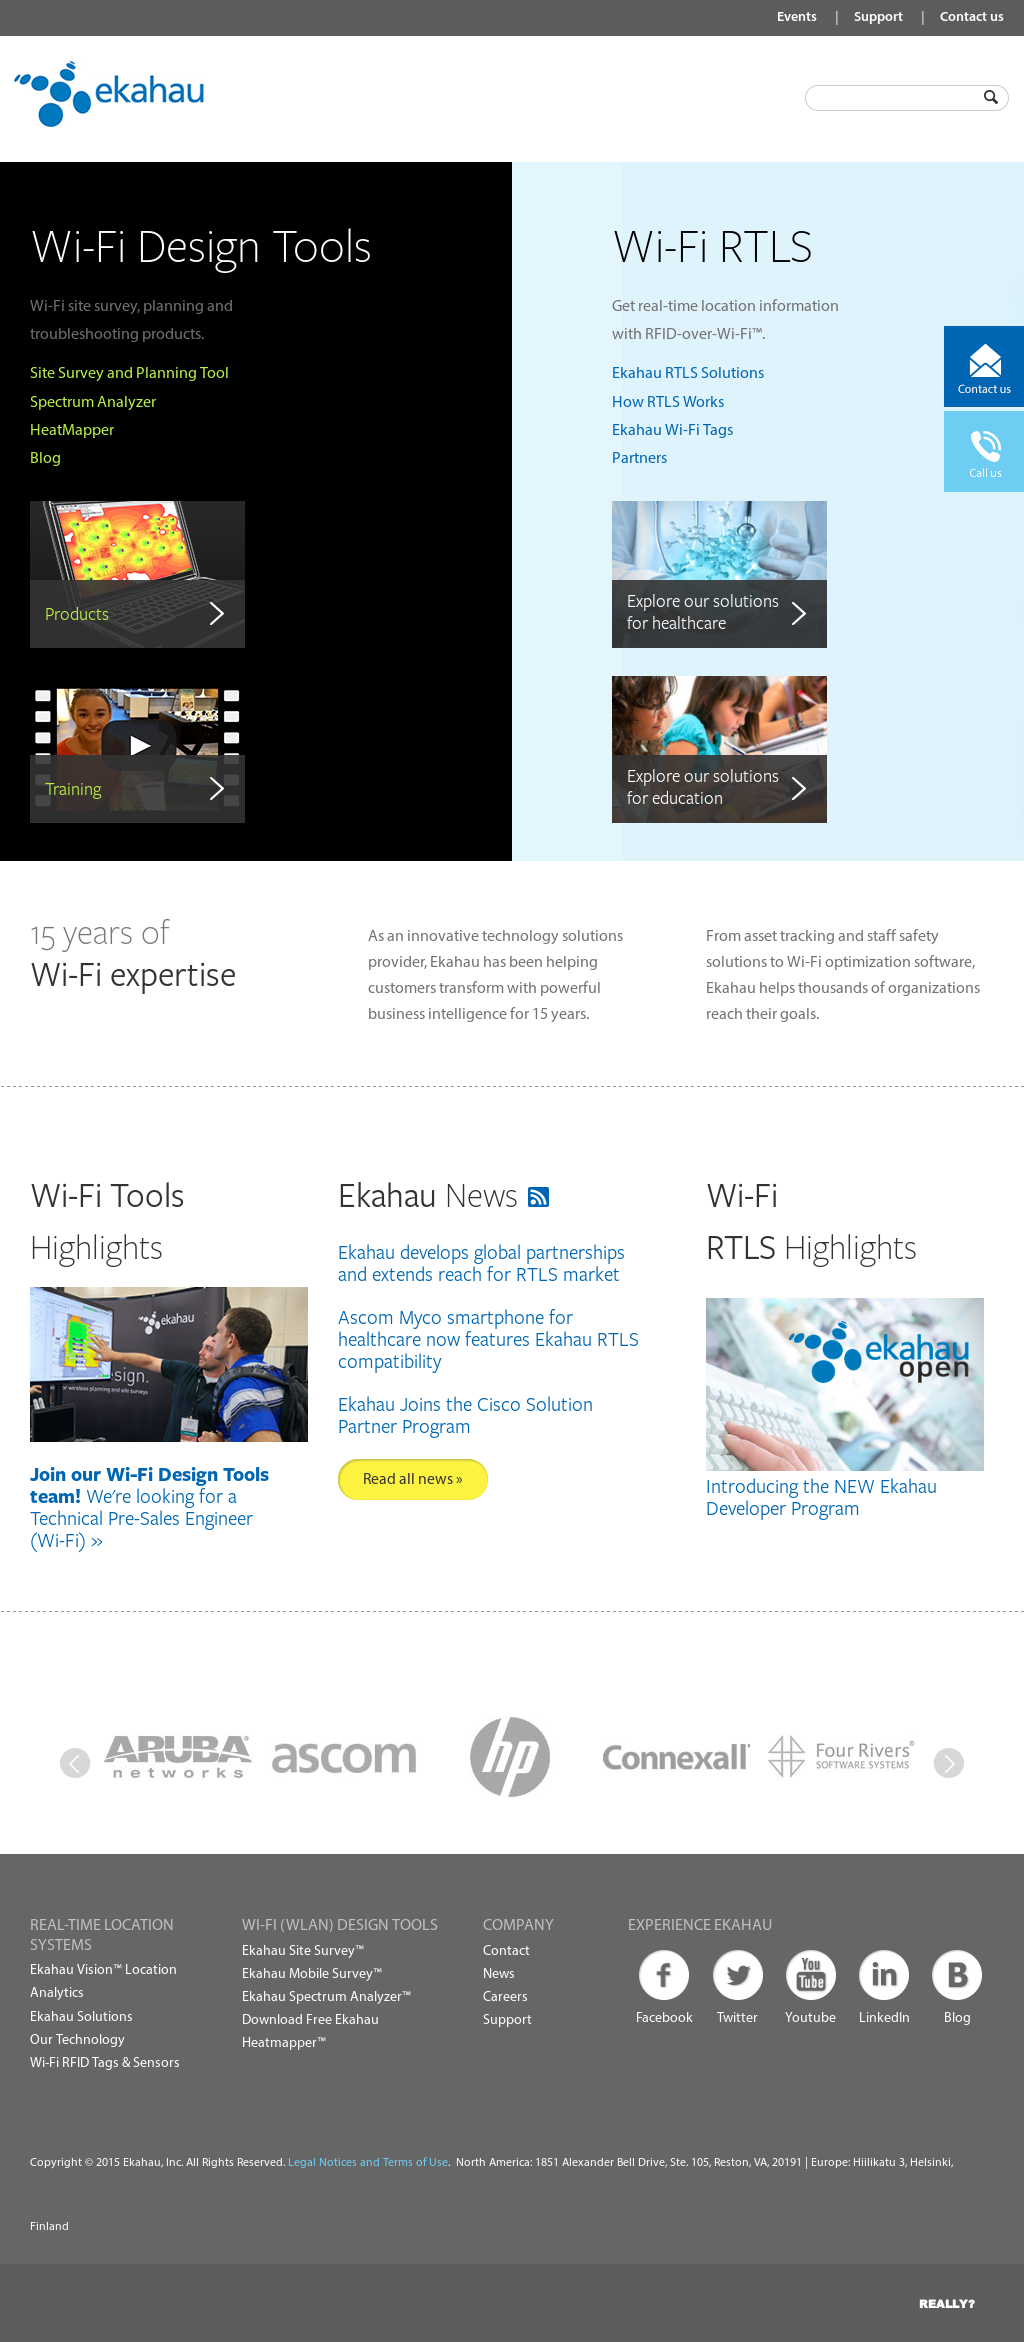 Ekahau Competitors, Revenue and Employees - Owler Company